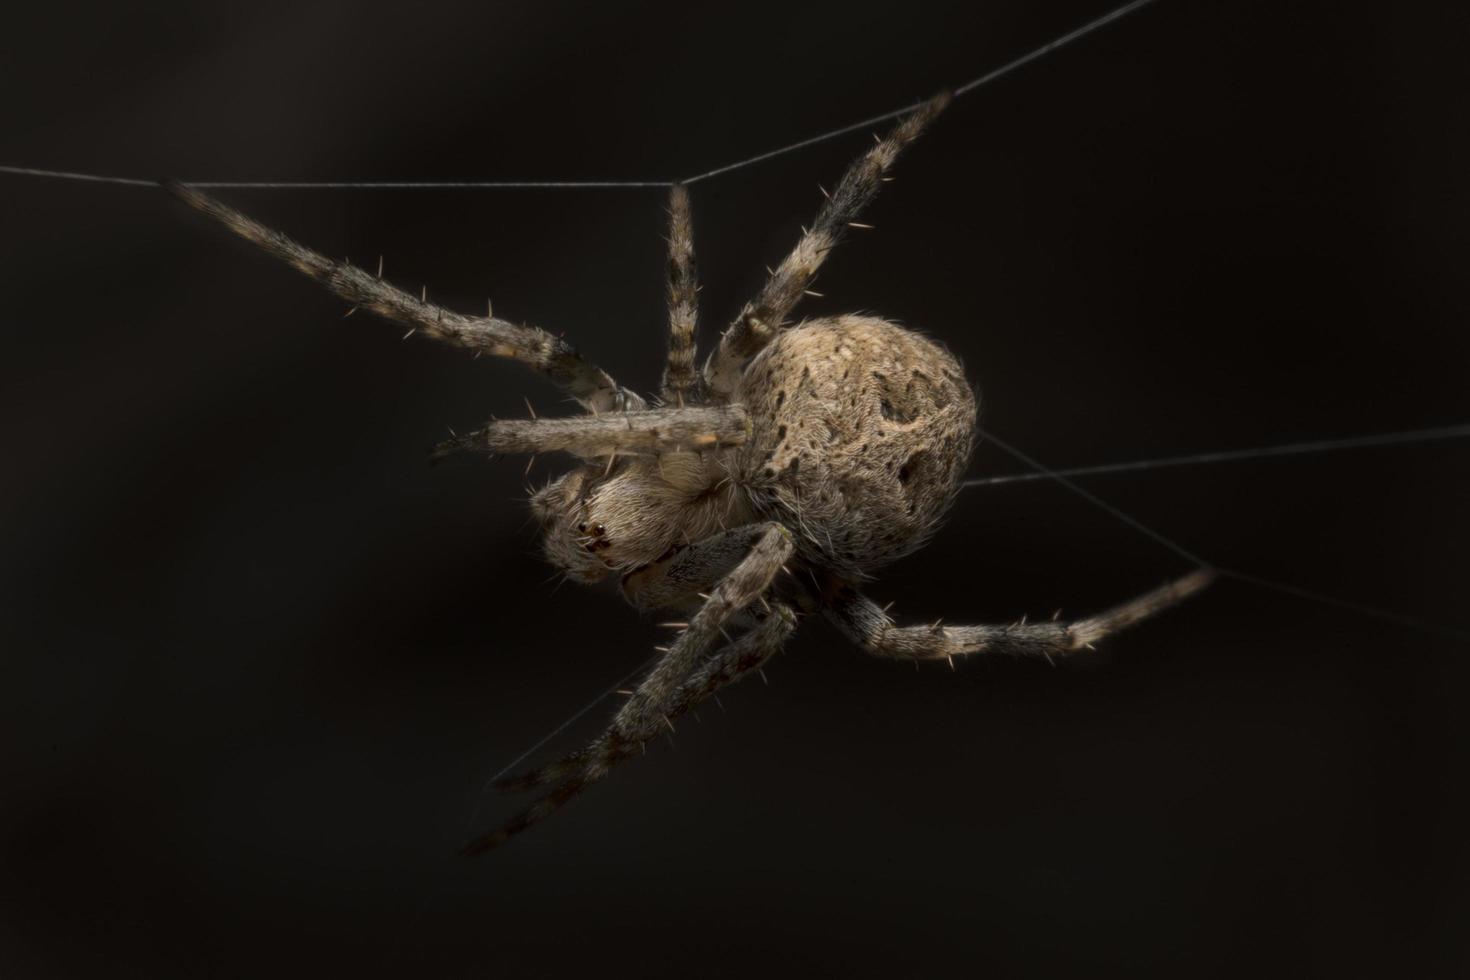 Close up of a garden spider  photo